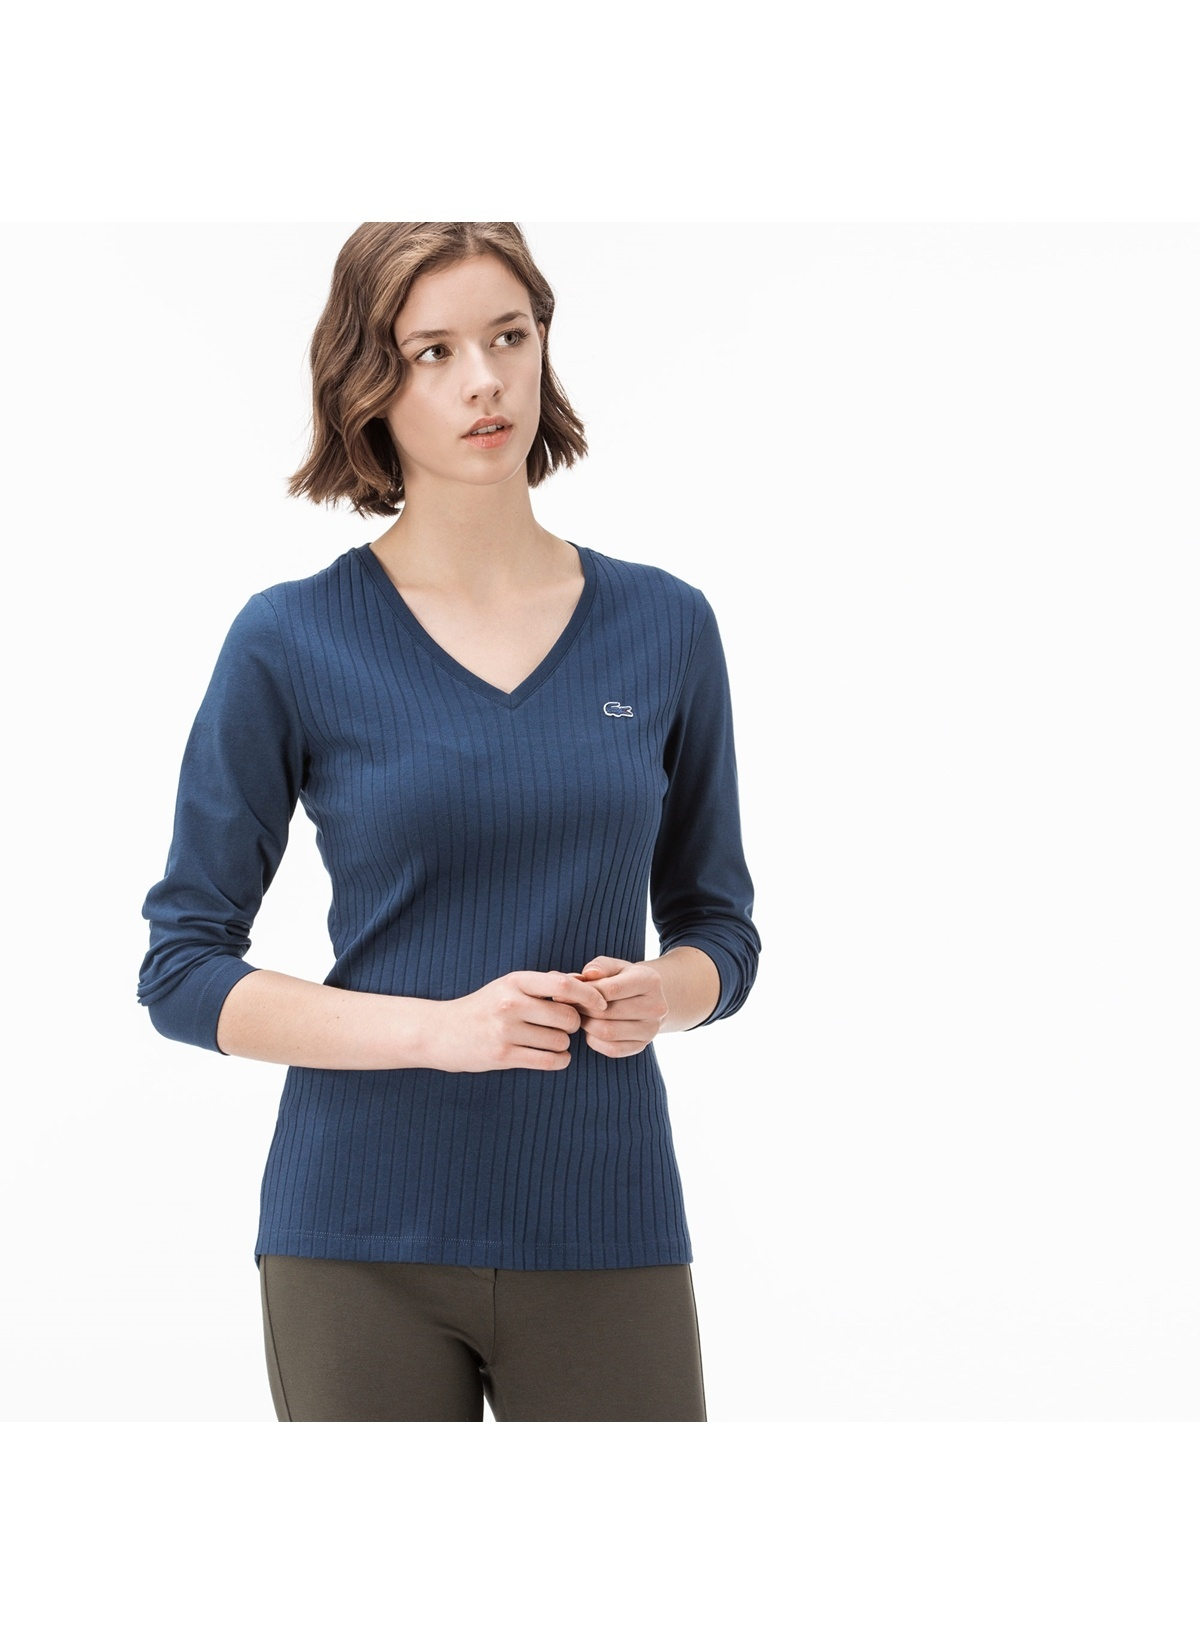 Lacoste Tişört Tf1911.11m T-shirt – 254.0 TL